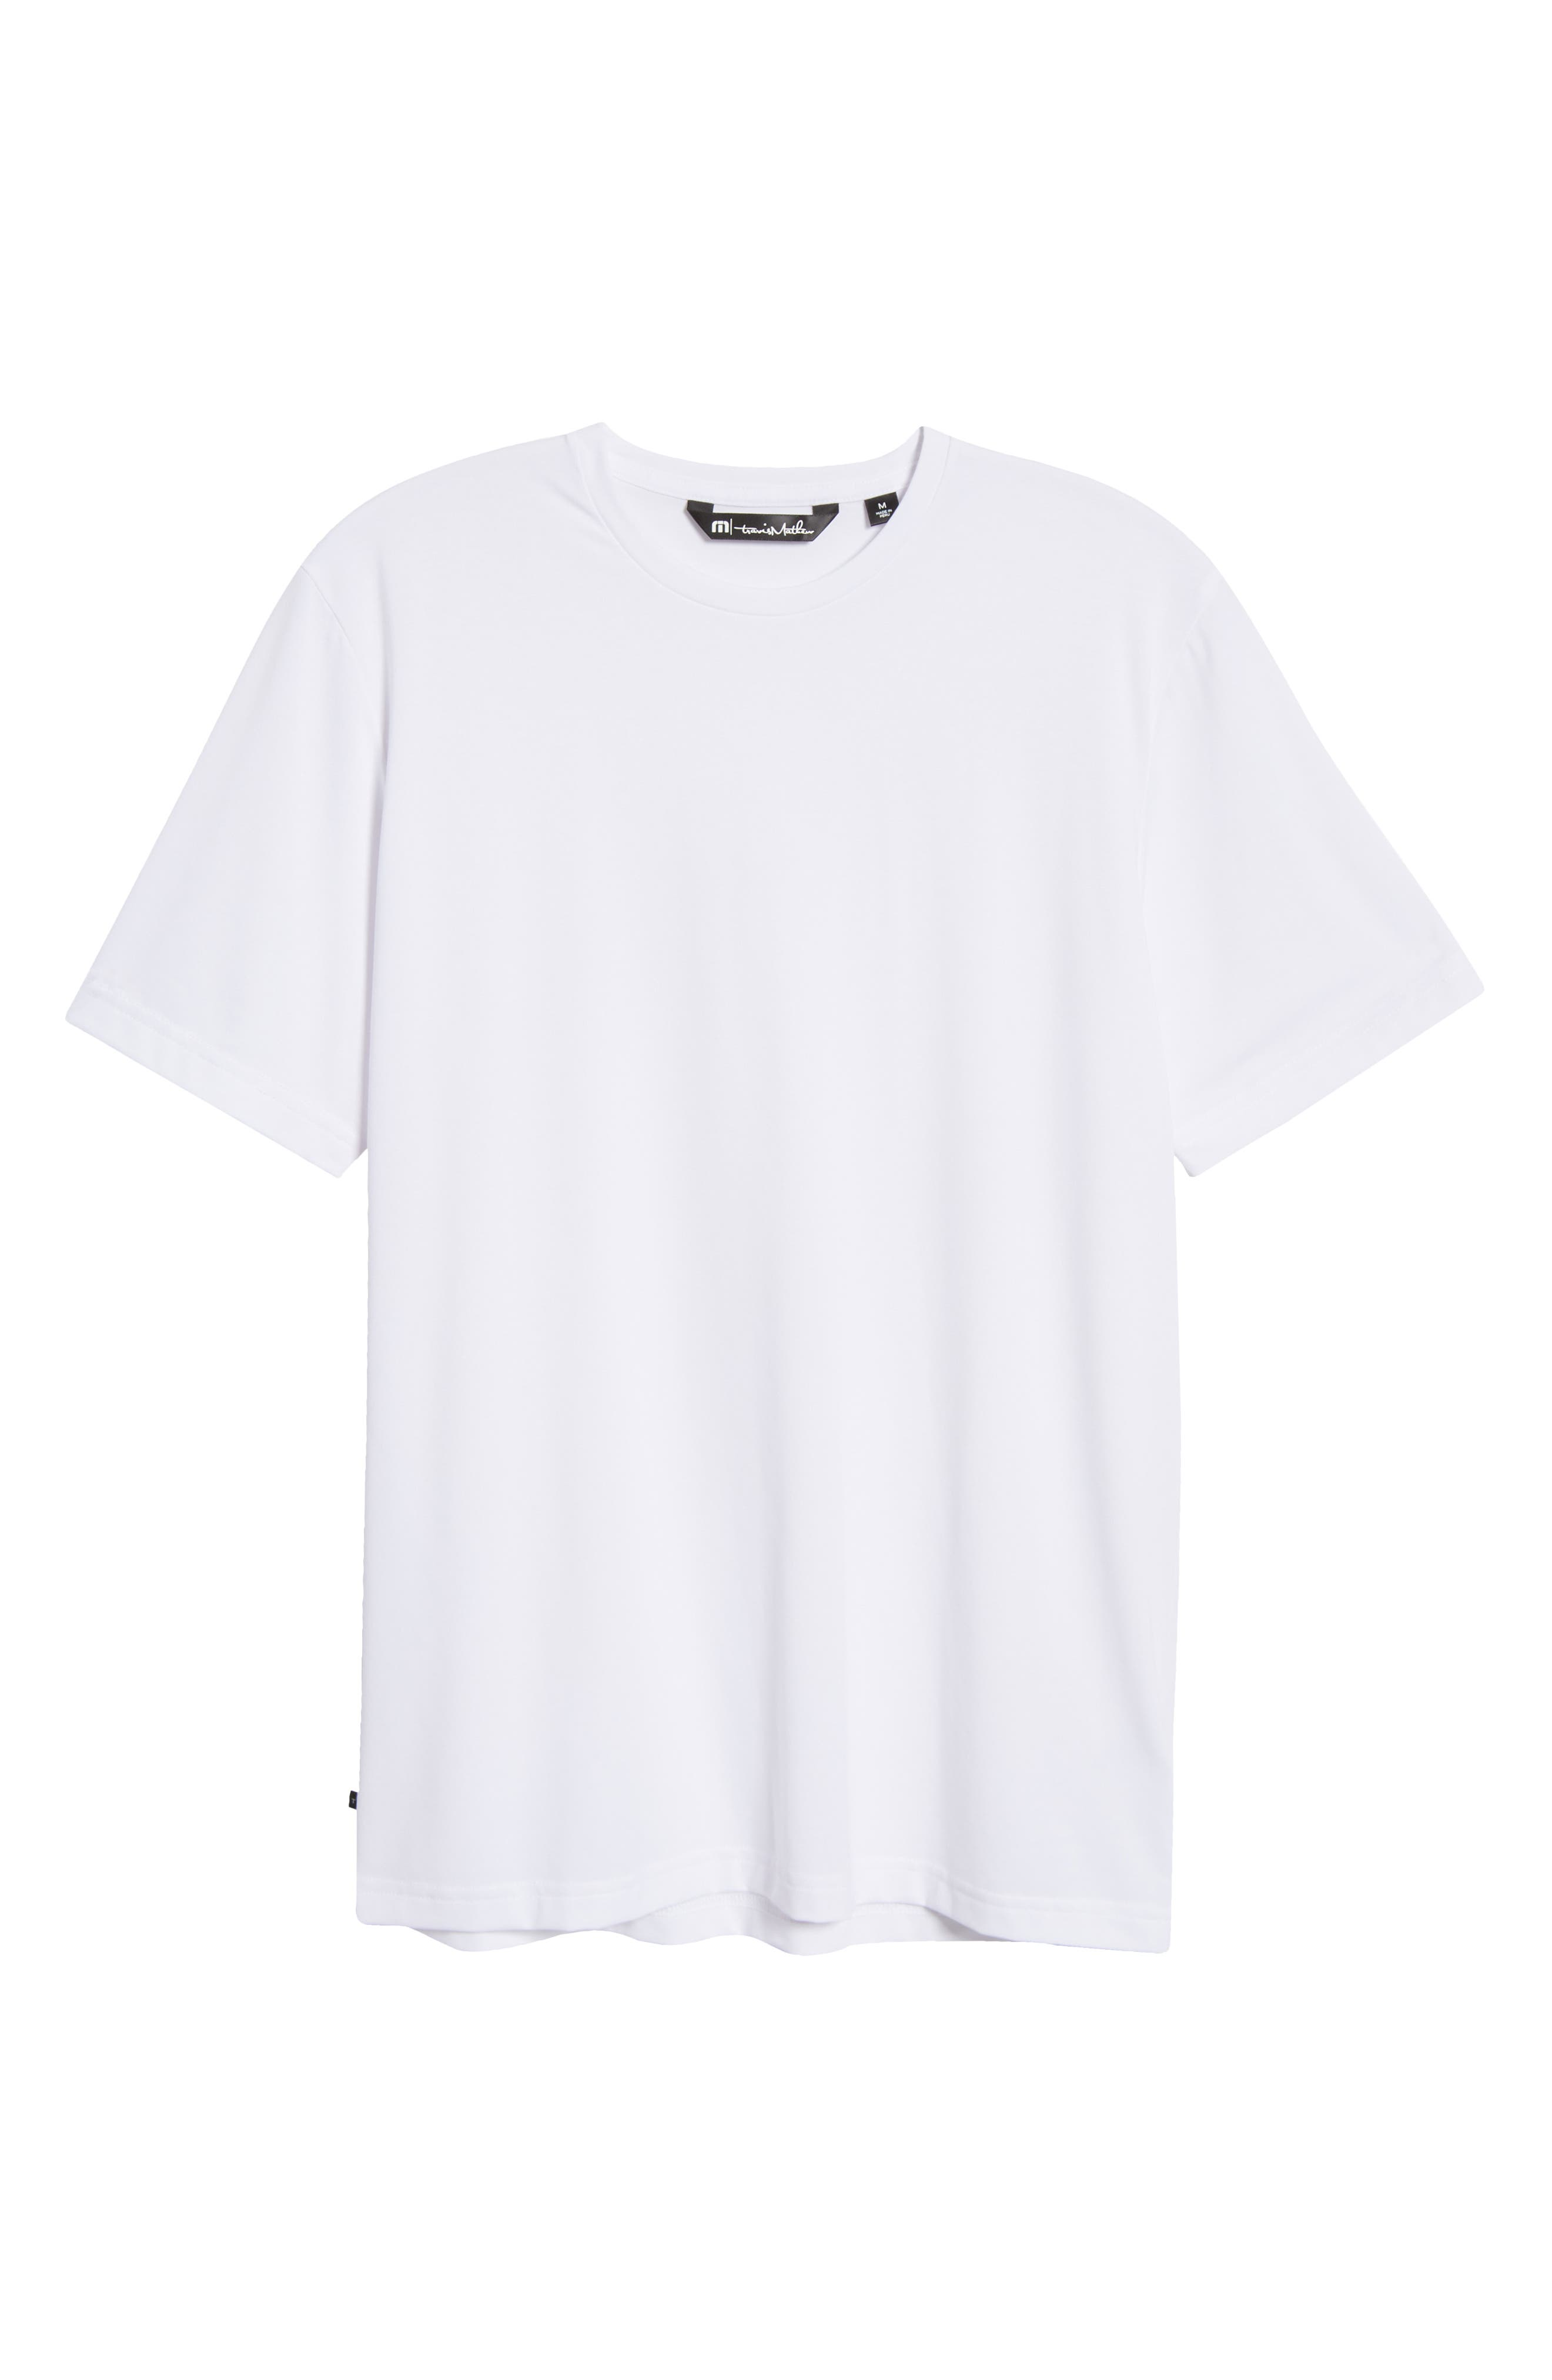 Floral Tops tee Shirt Monochrome Spring Flowers Short Sleeve O-Neck Tees Tshirt